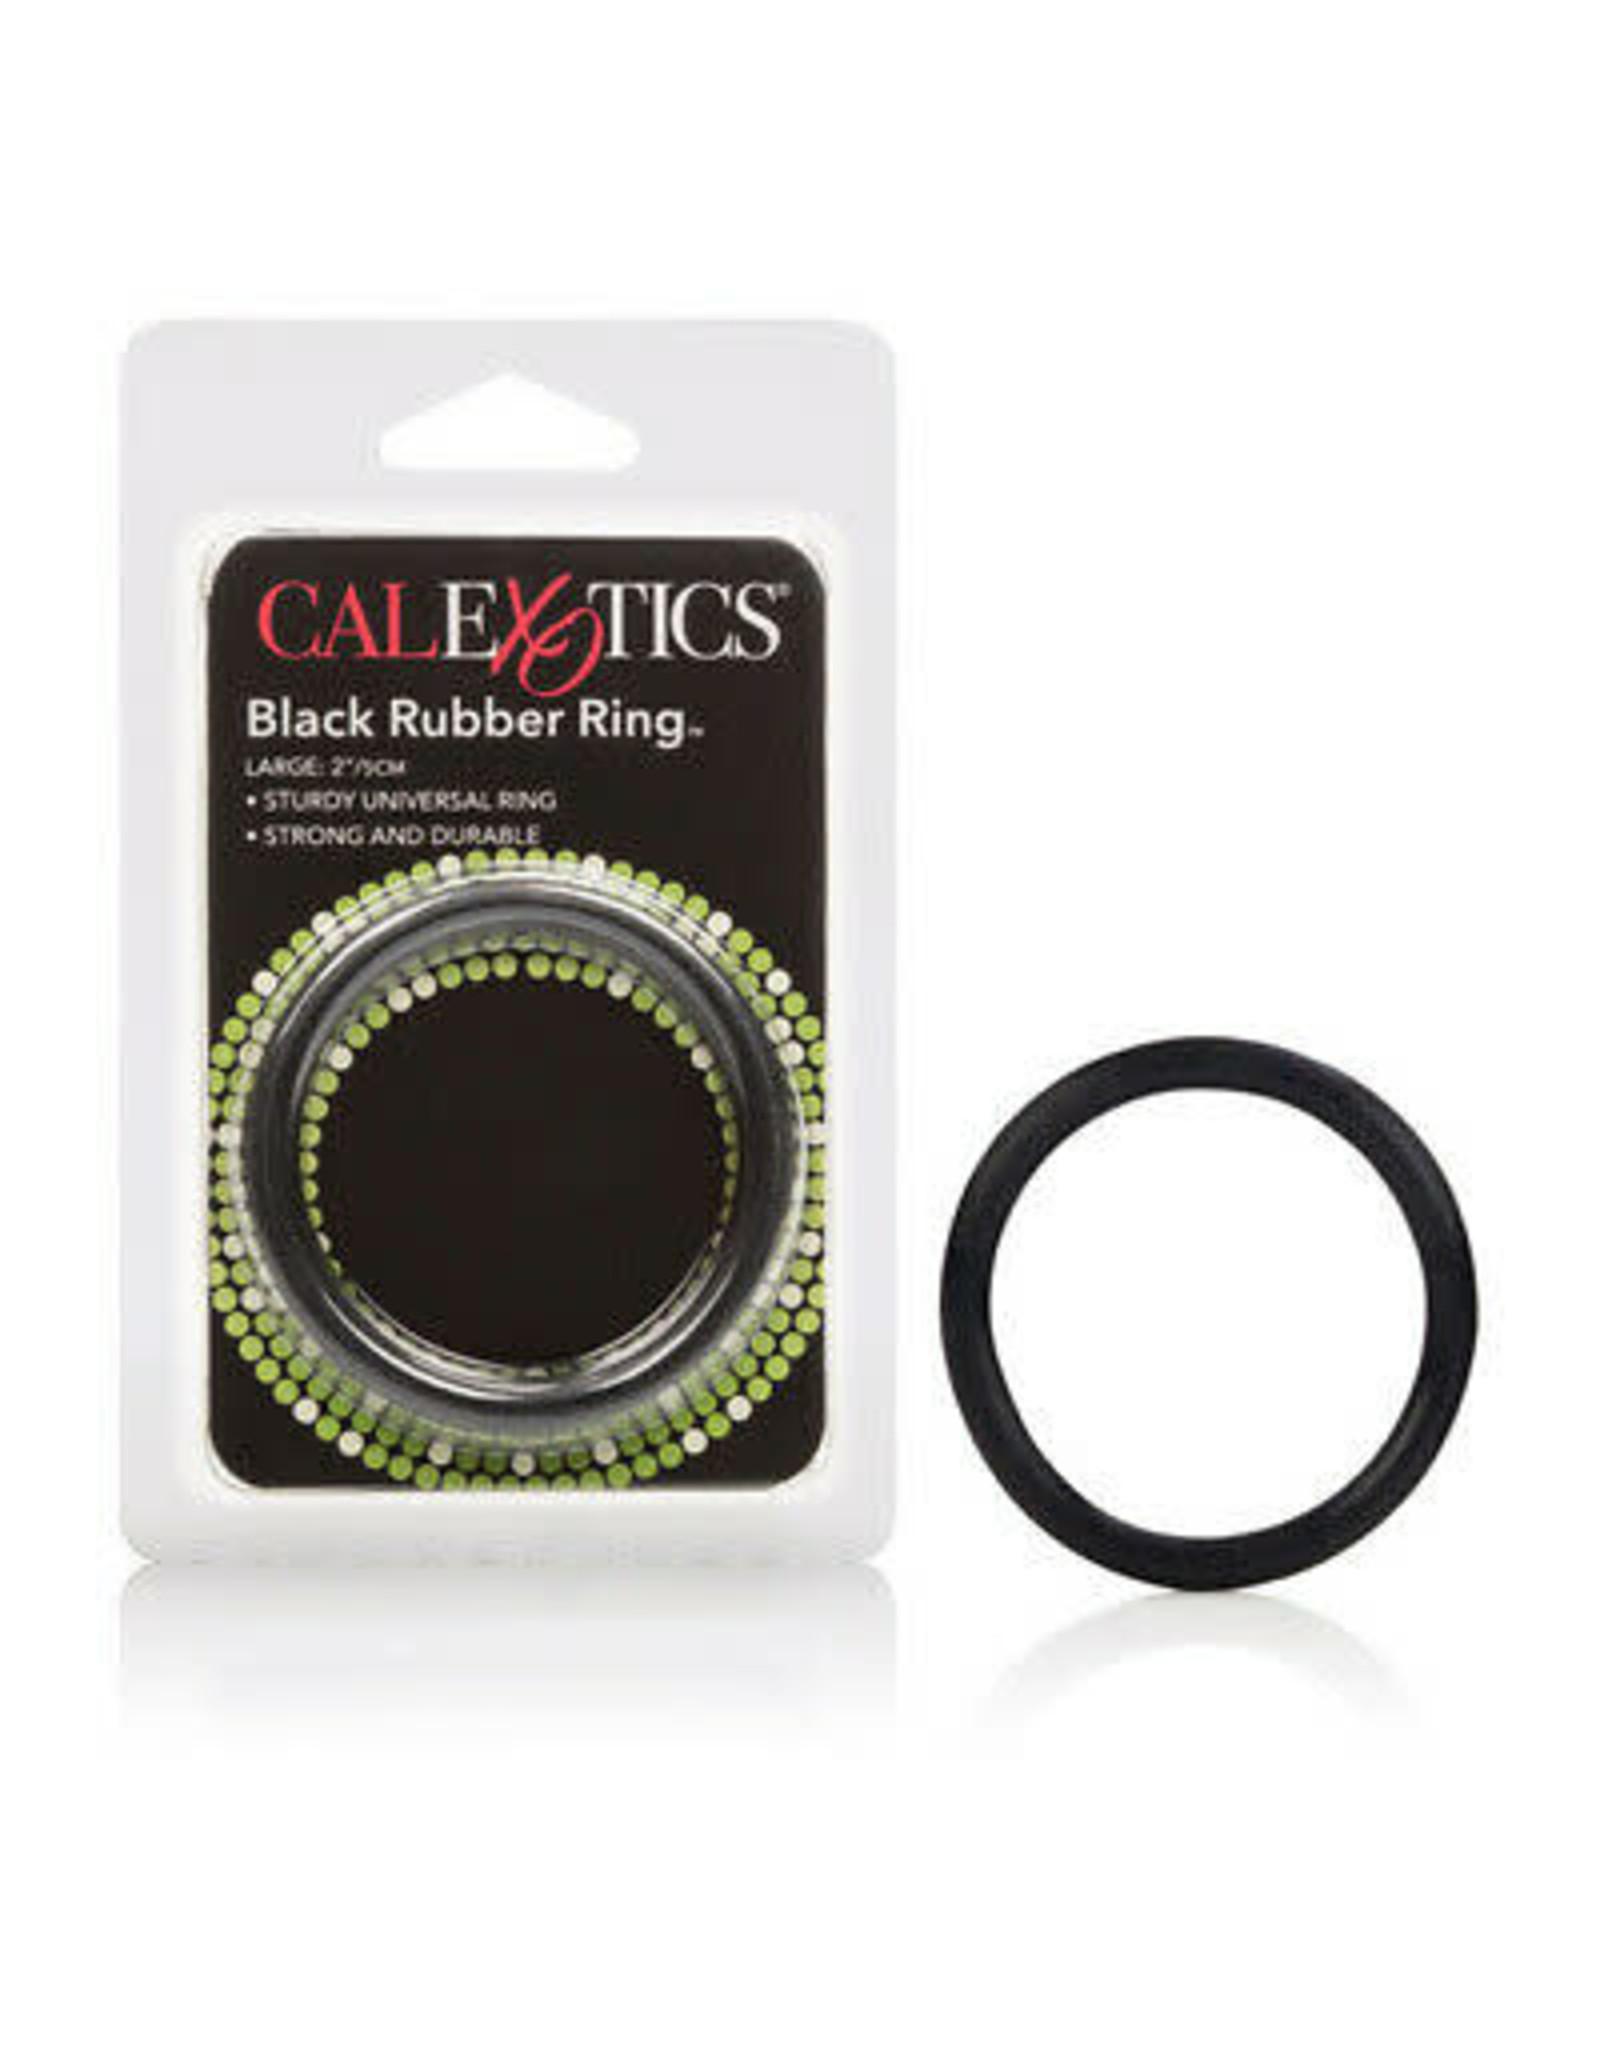 CALEXOTICS RUBBER RING BLACK - LARGE